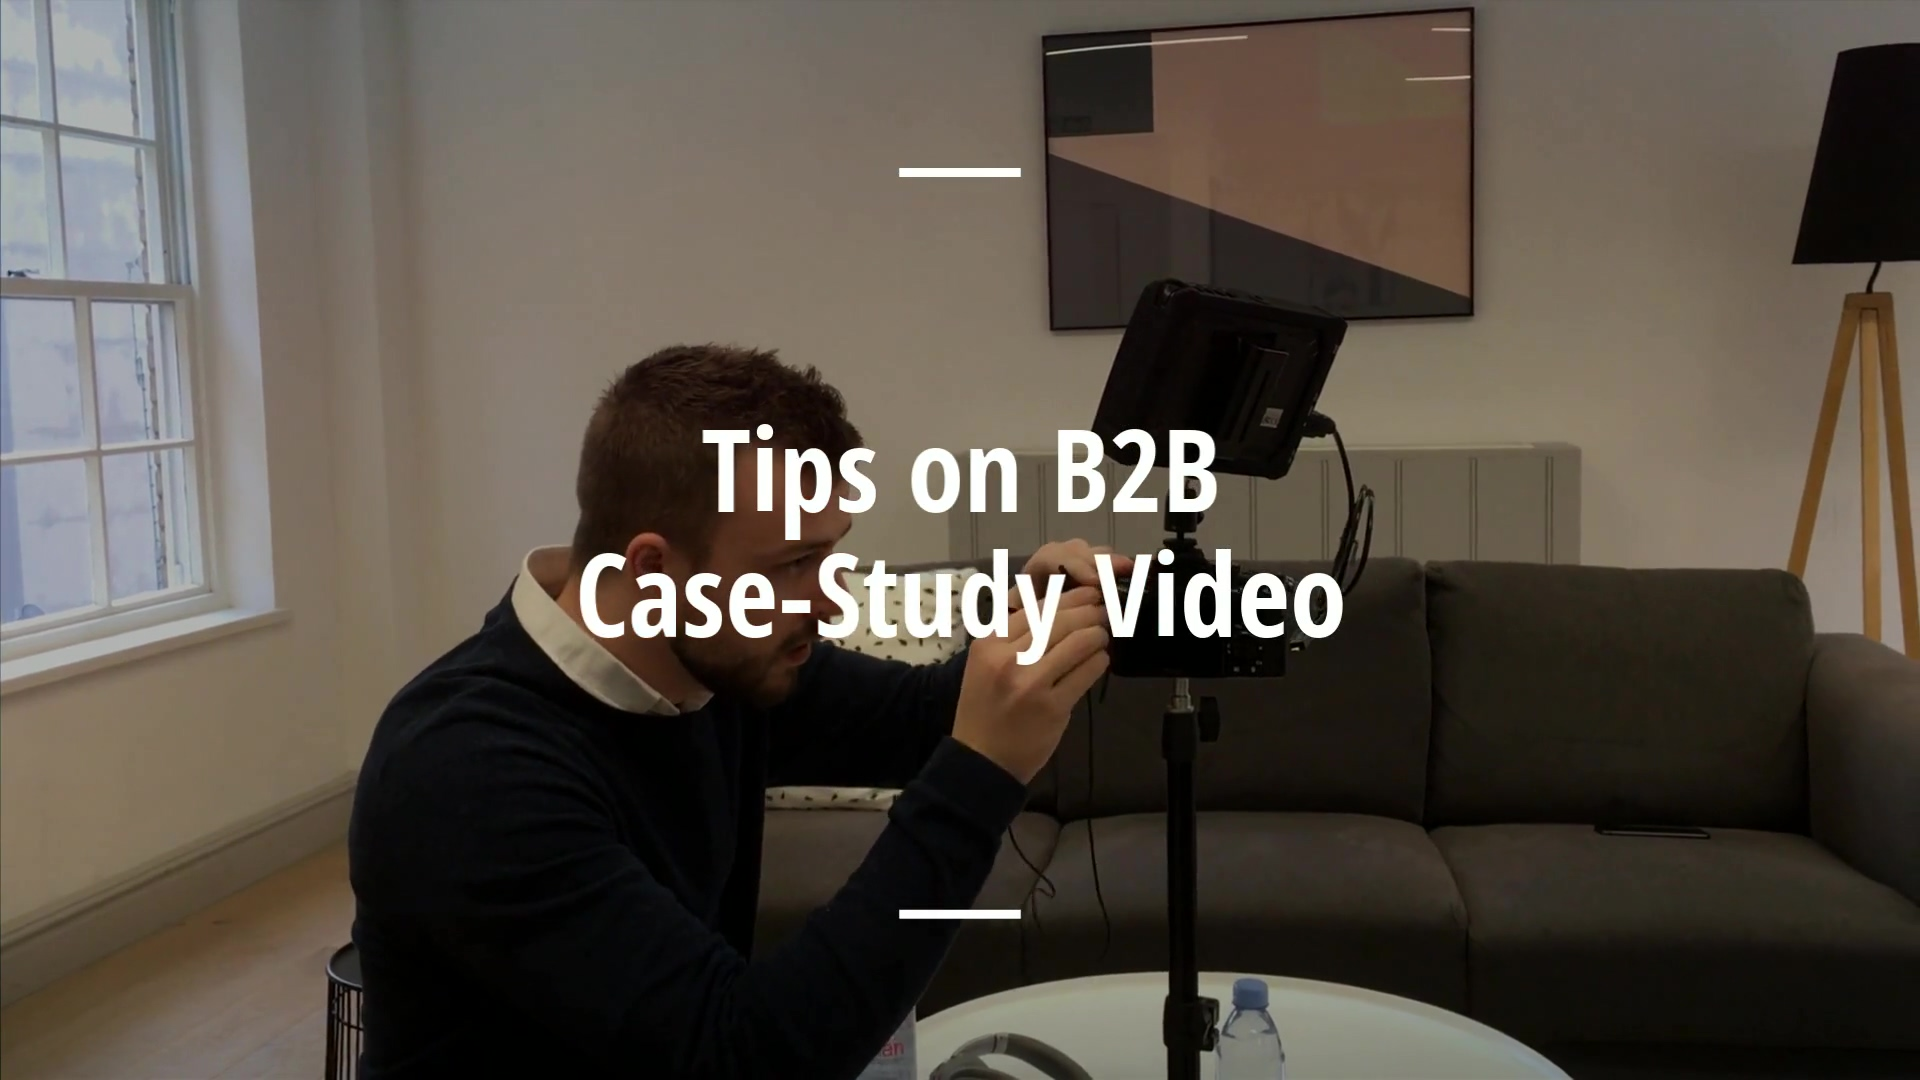 Tips on B2B Case-Study Video_FULL_HD